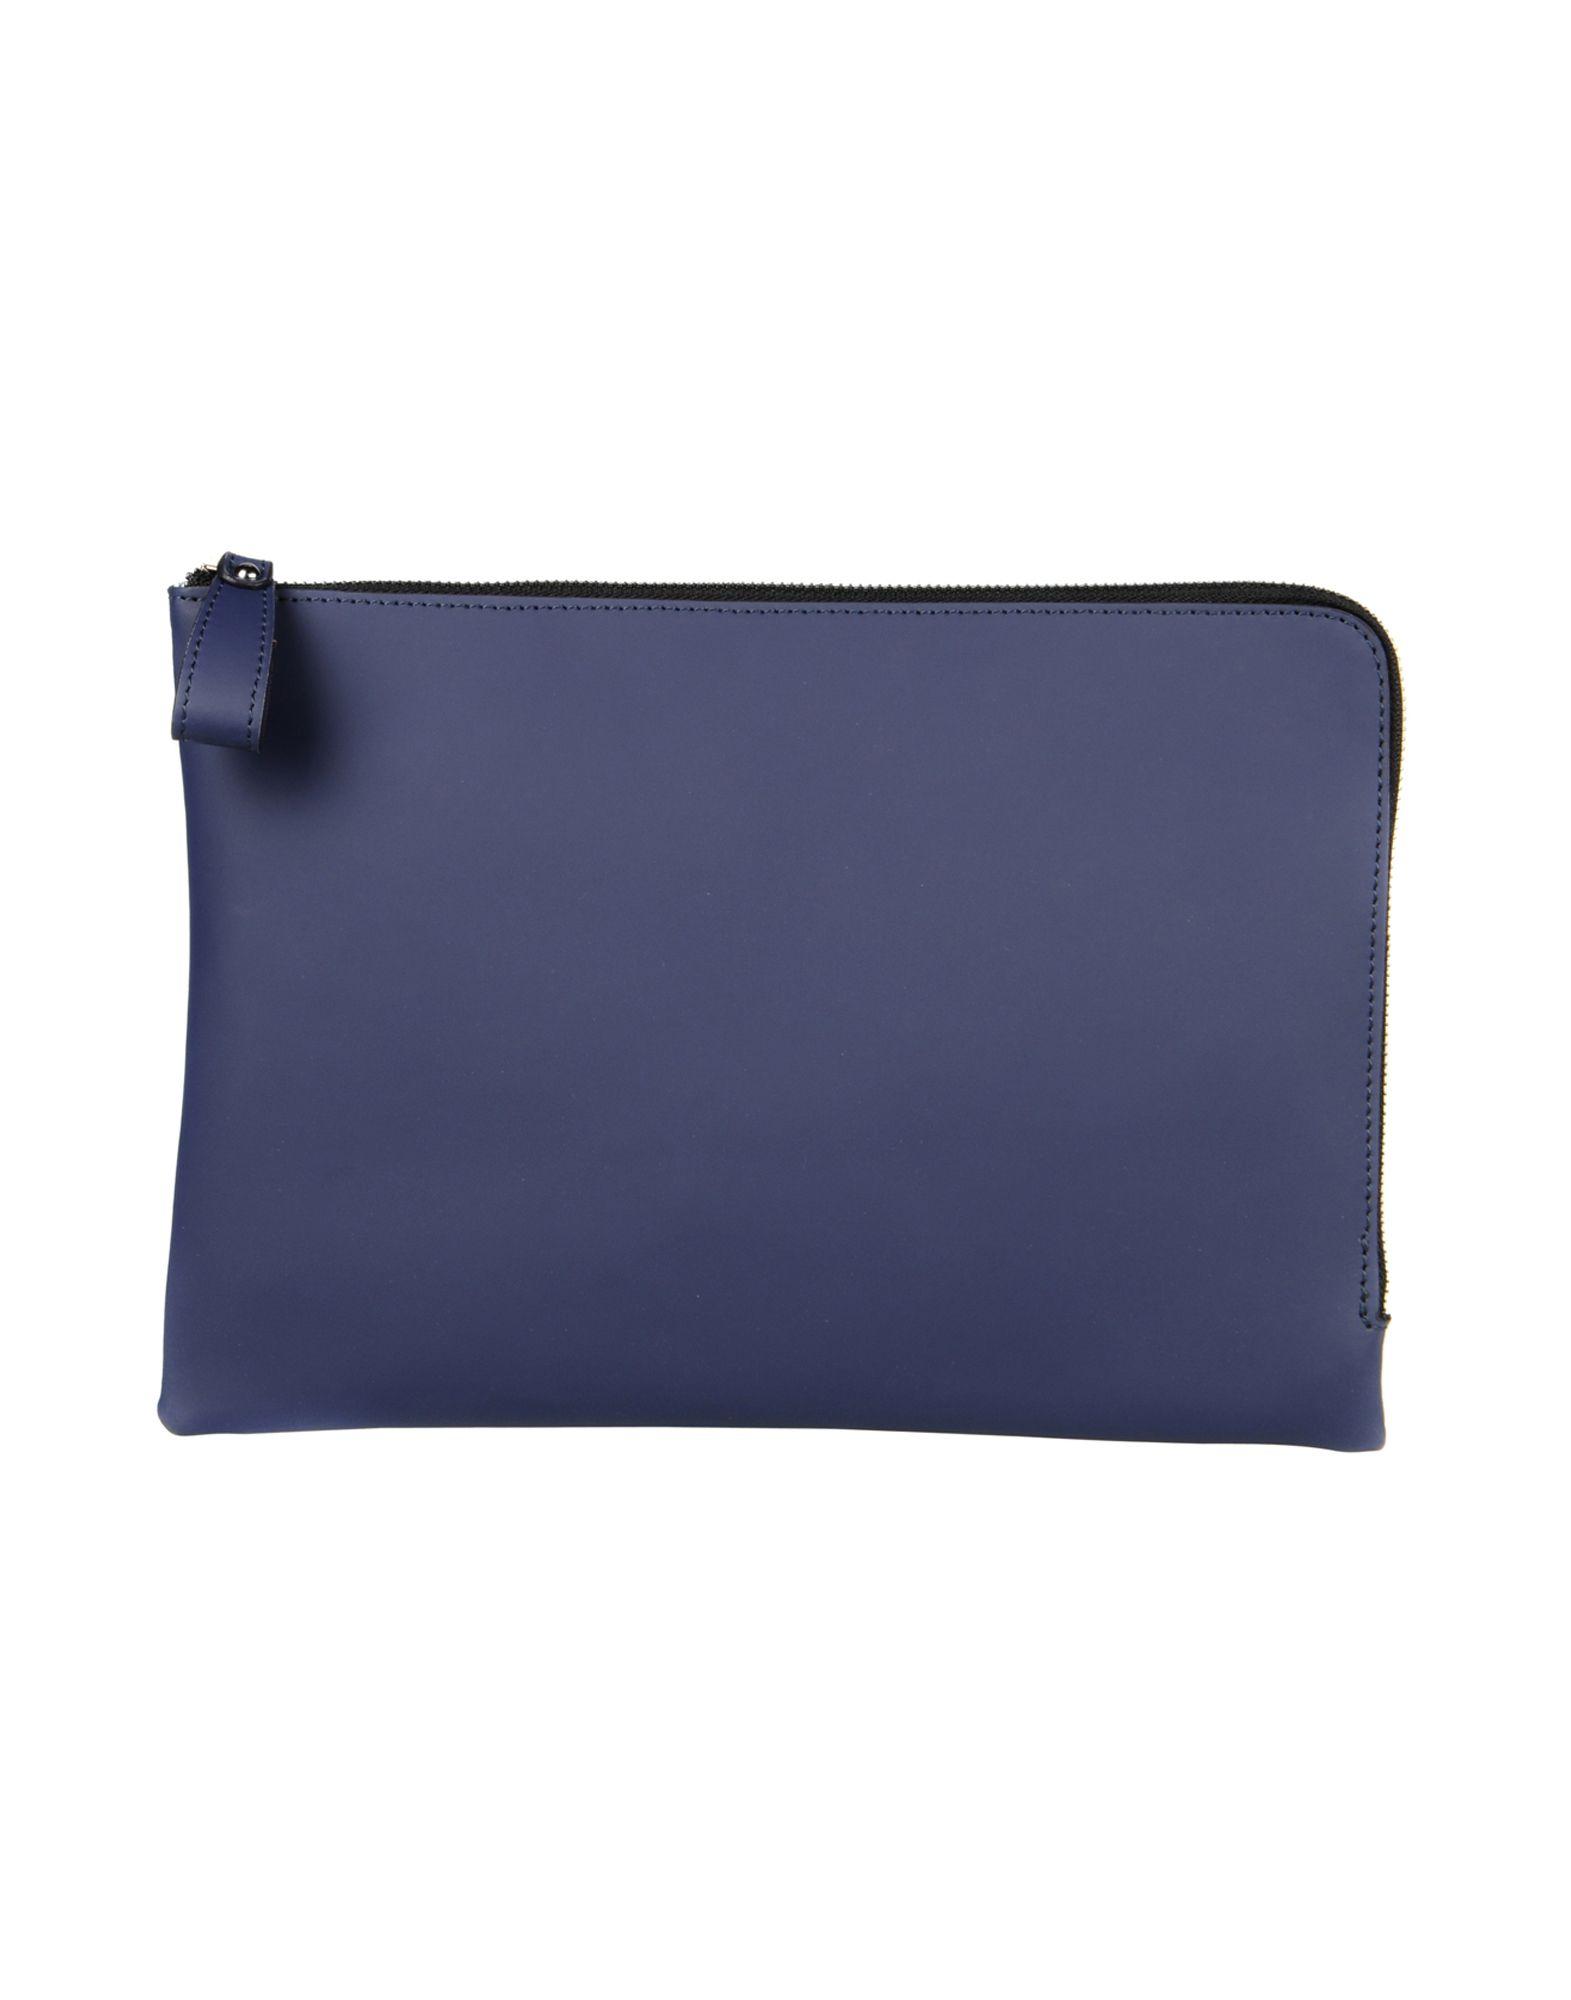 8 Деловые сумки мужские сумки